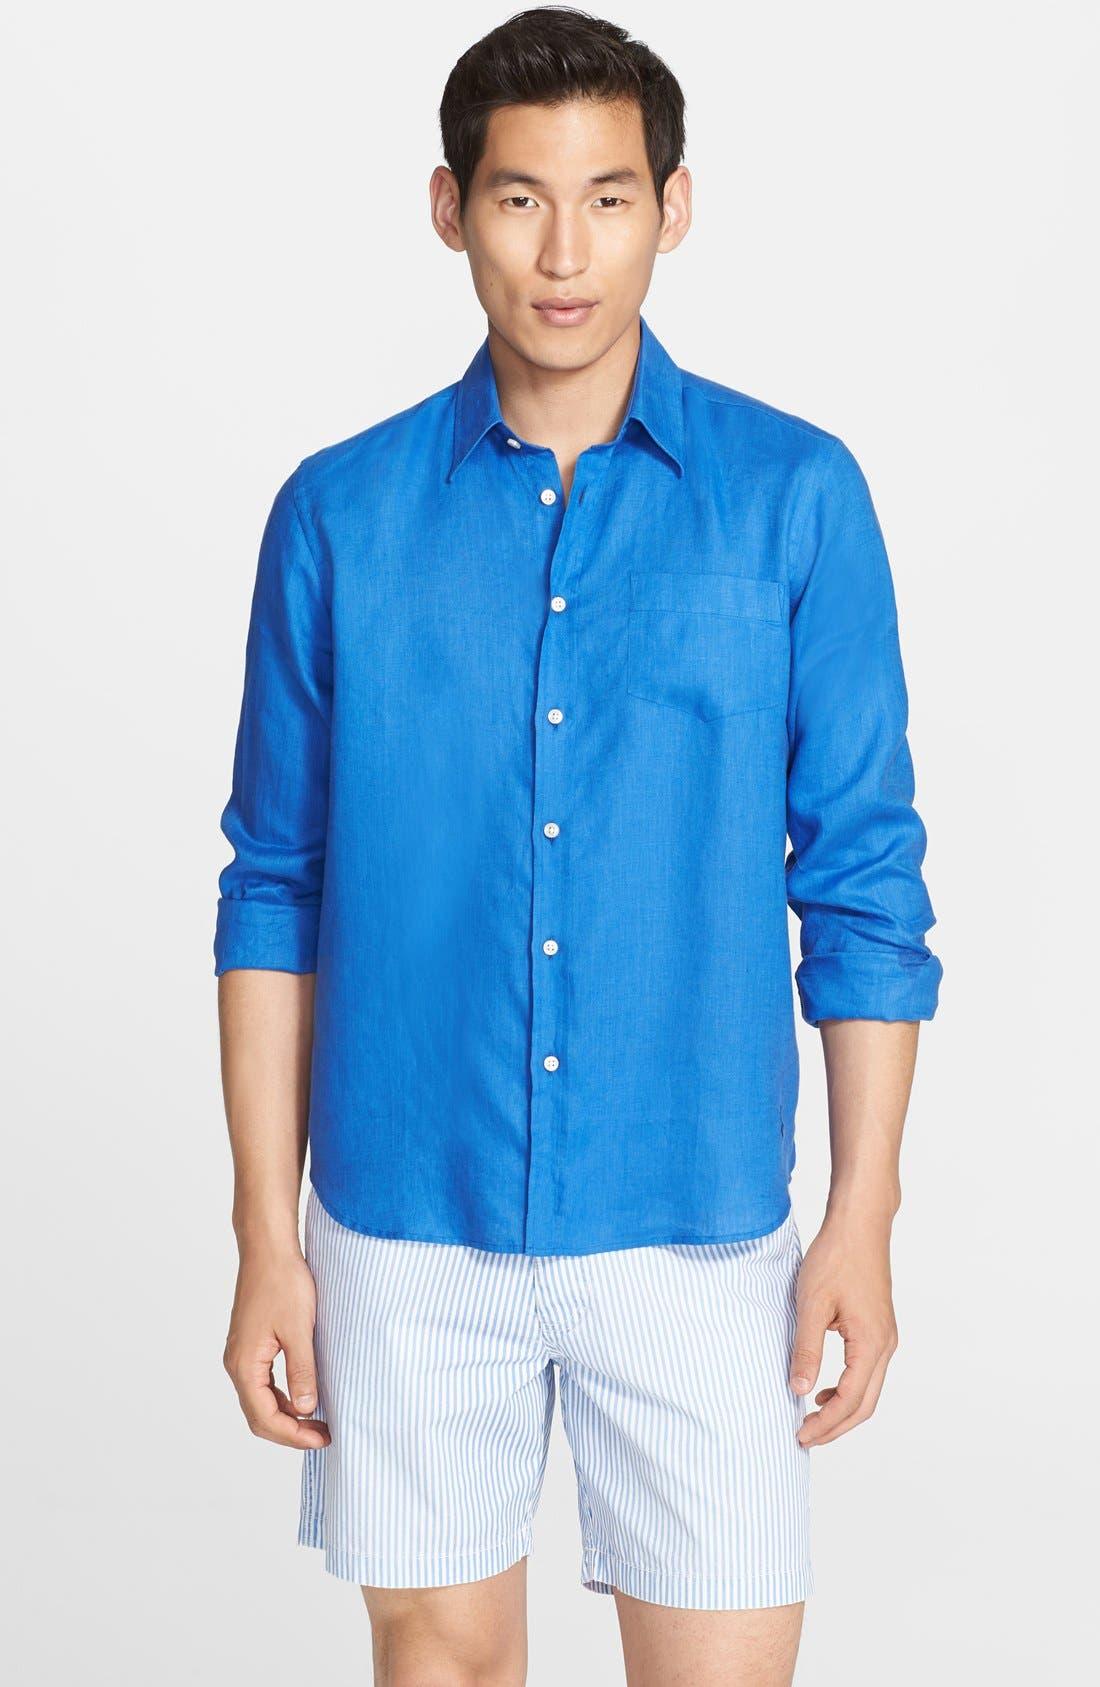 'Caroubier' Linen Shirt,                             Main thumbnail 10, color,